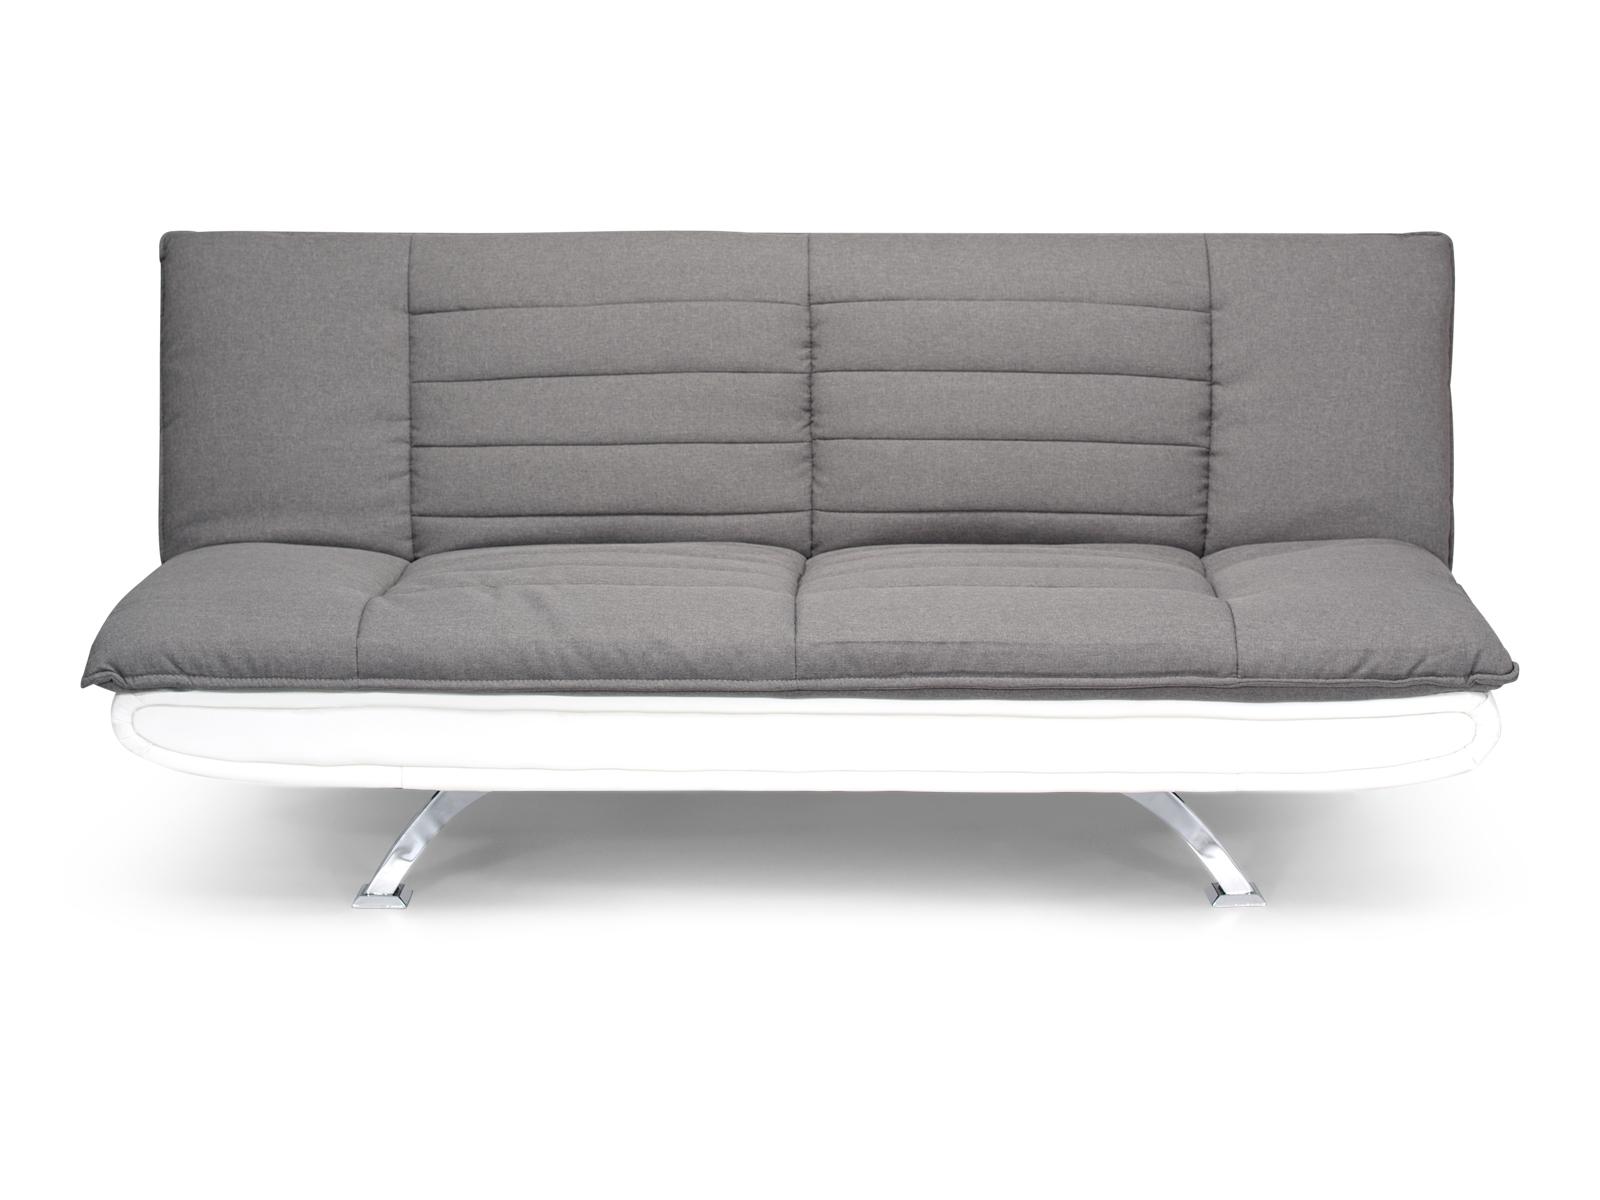 Canapea extensibila tapitata cu stofa 3 locuri Bart Grey/White l193xA102xH86 cm